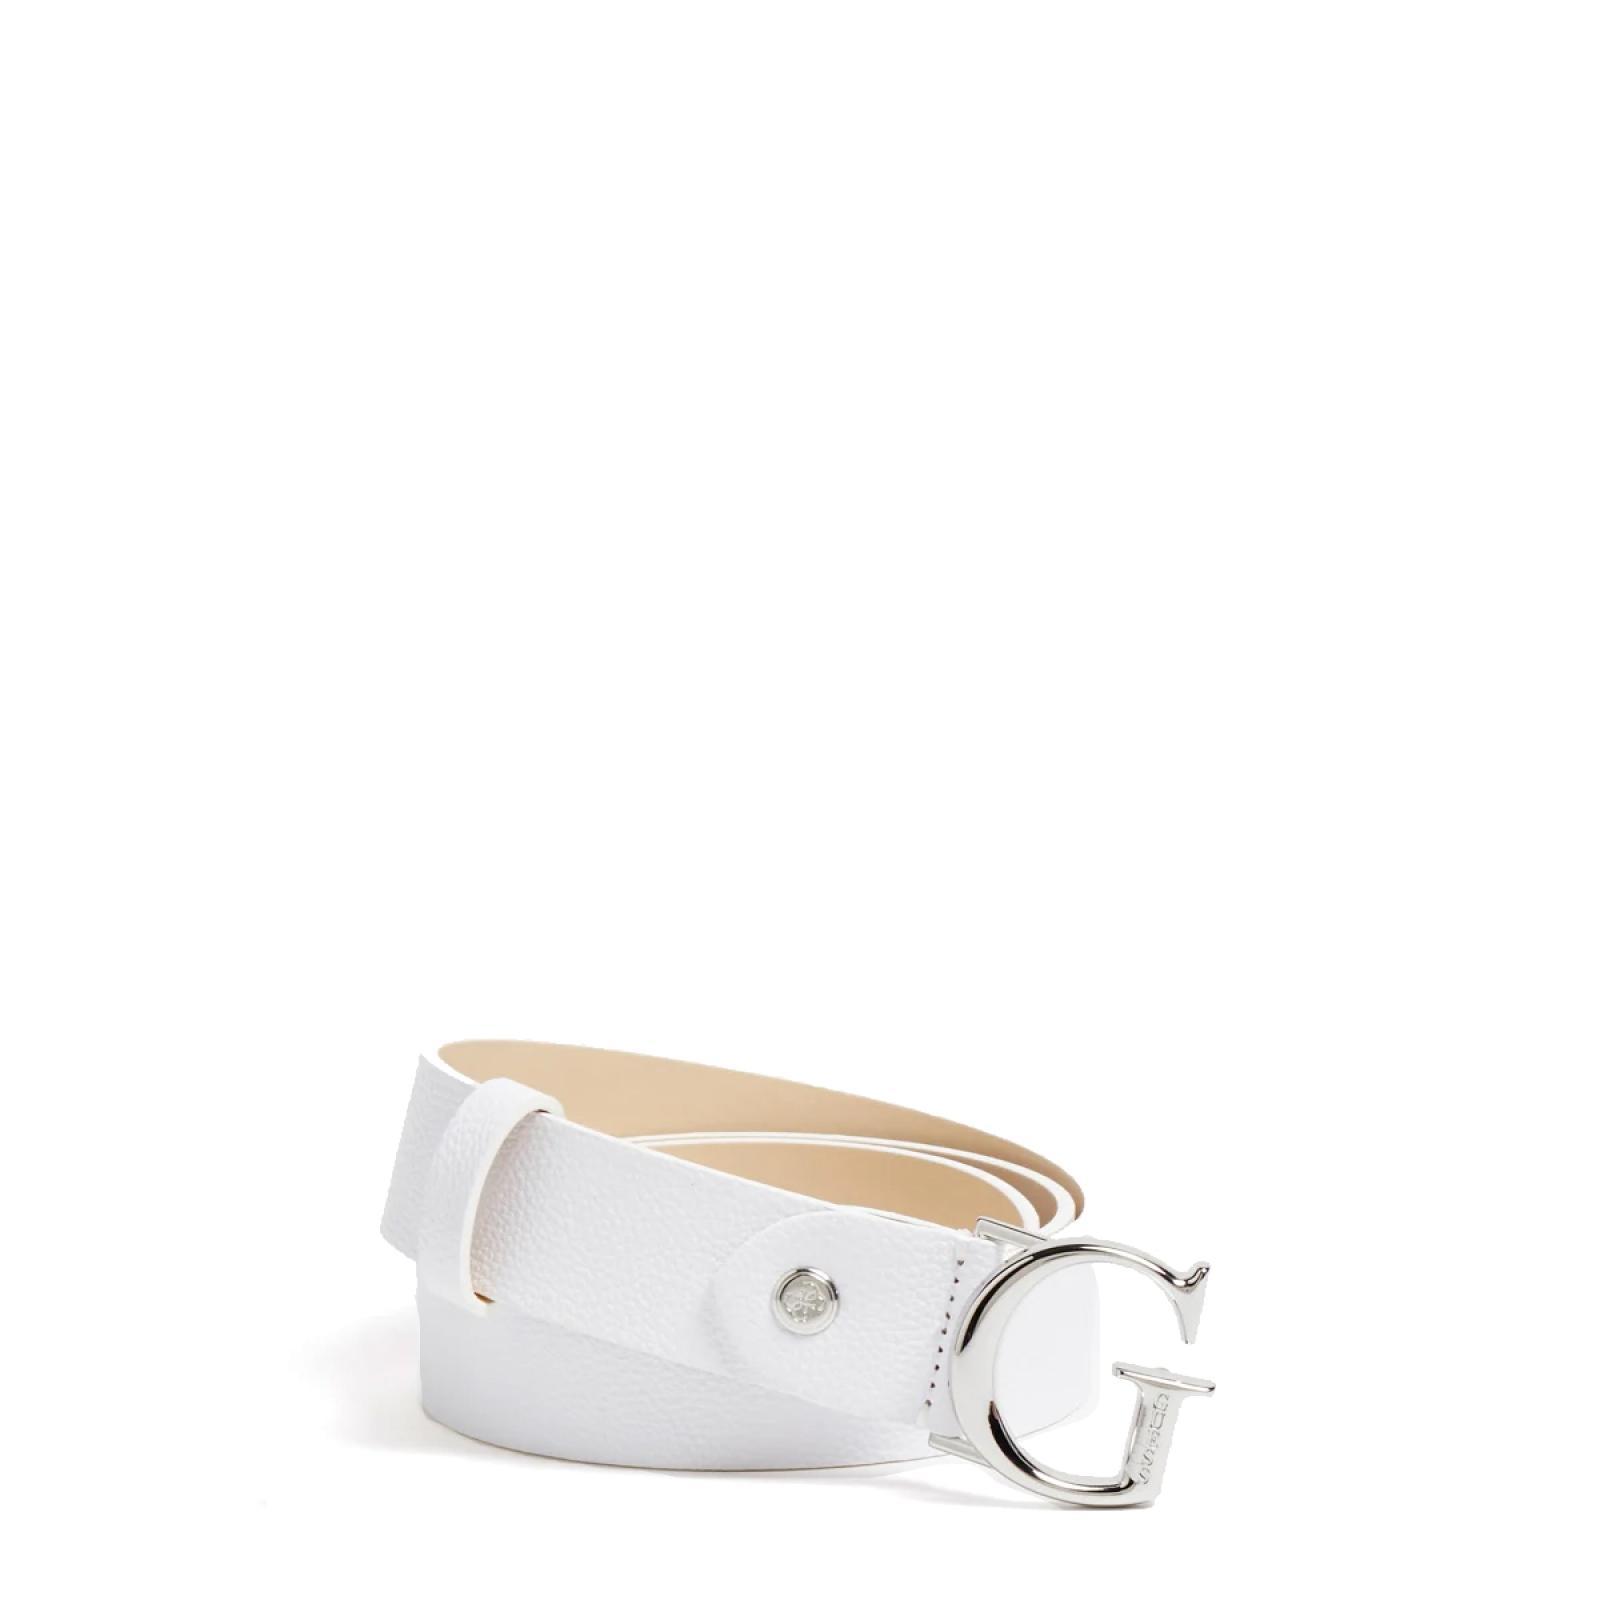 Guess Cintura Corily White - 1